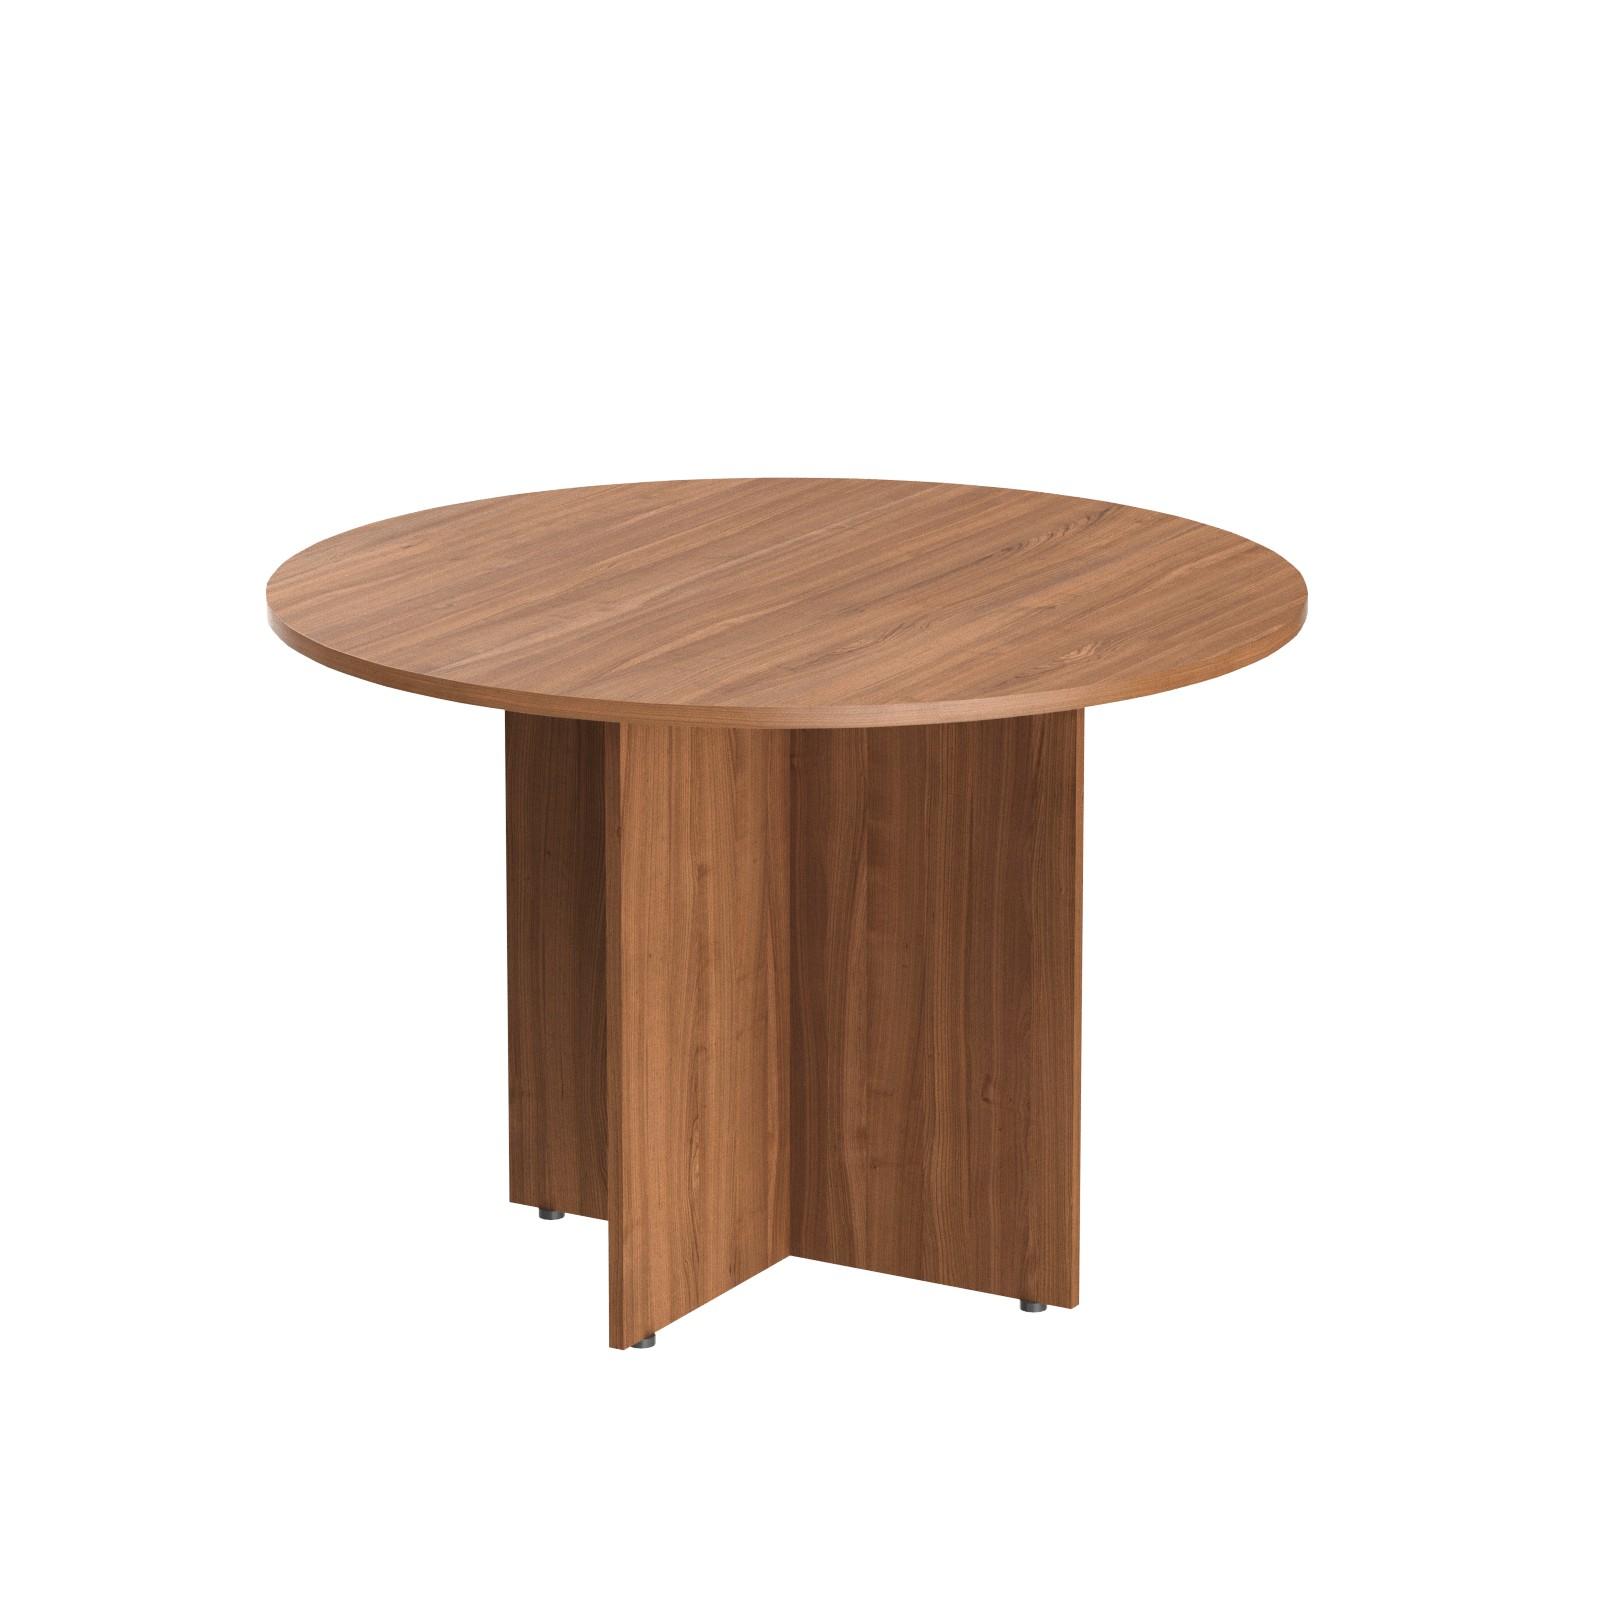 Стол круглый Имаго ПРГ-1